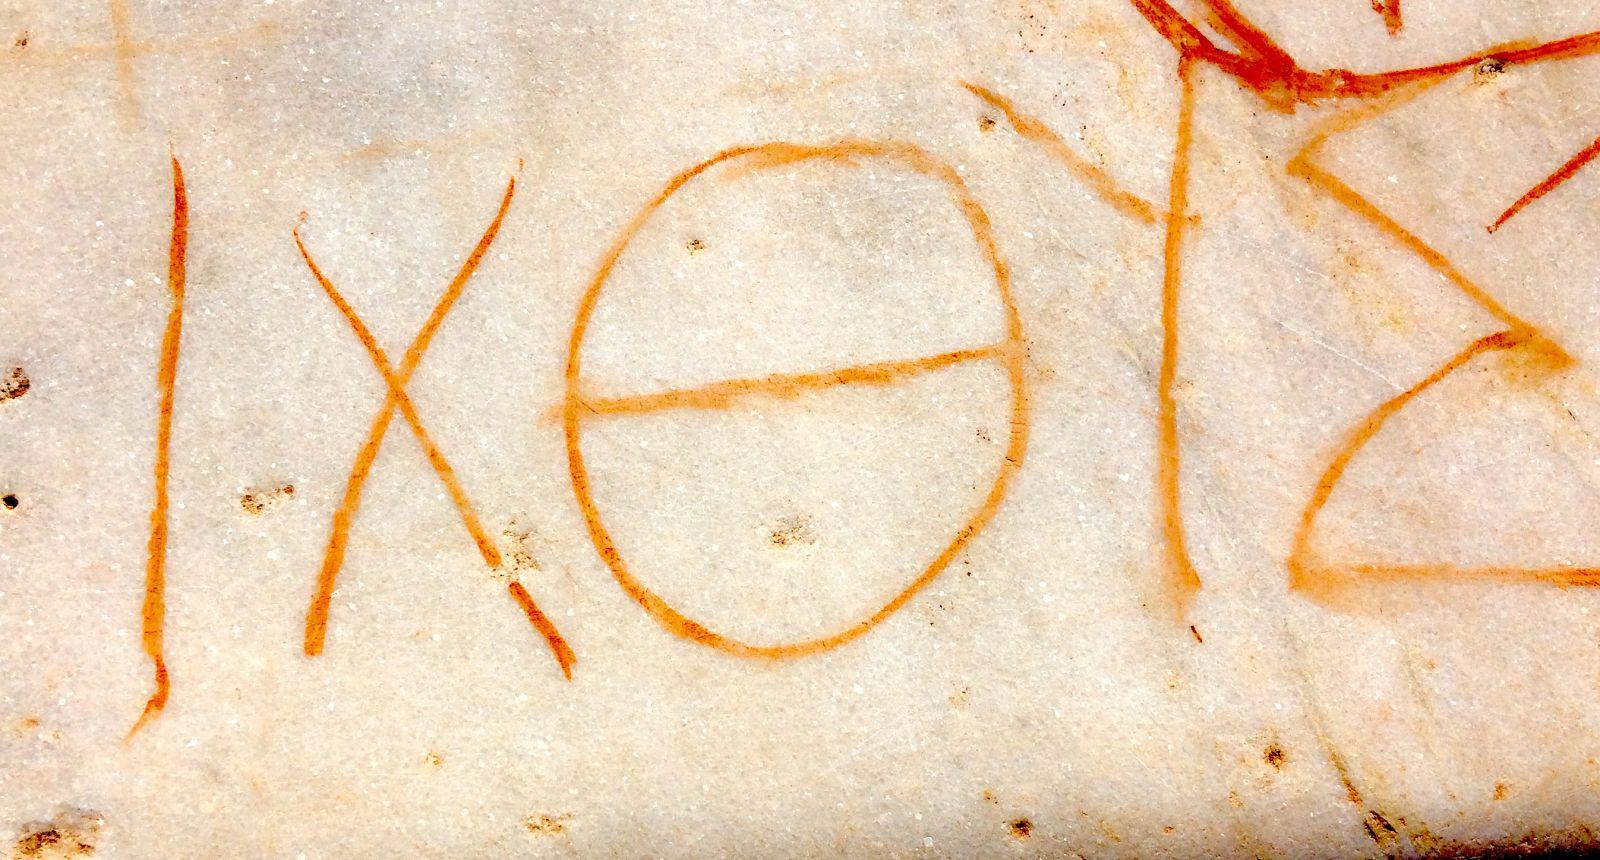 sign-of-jesus-in-greece